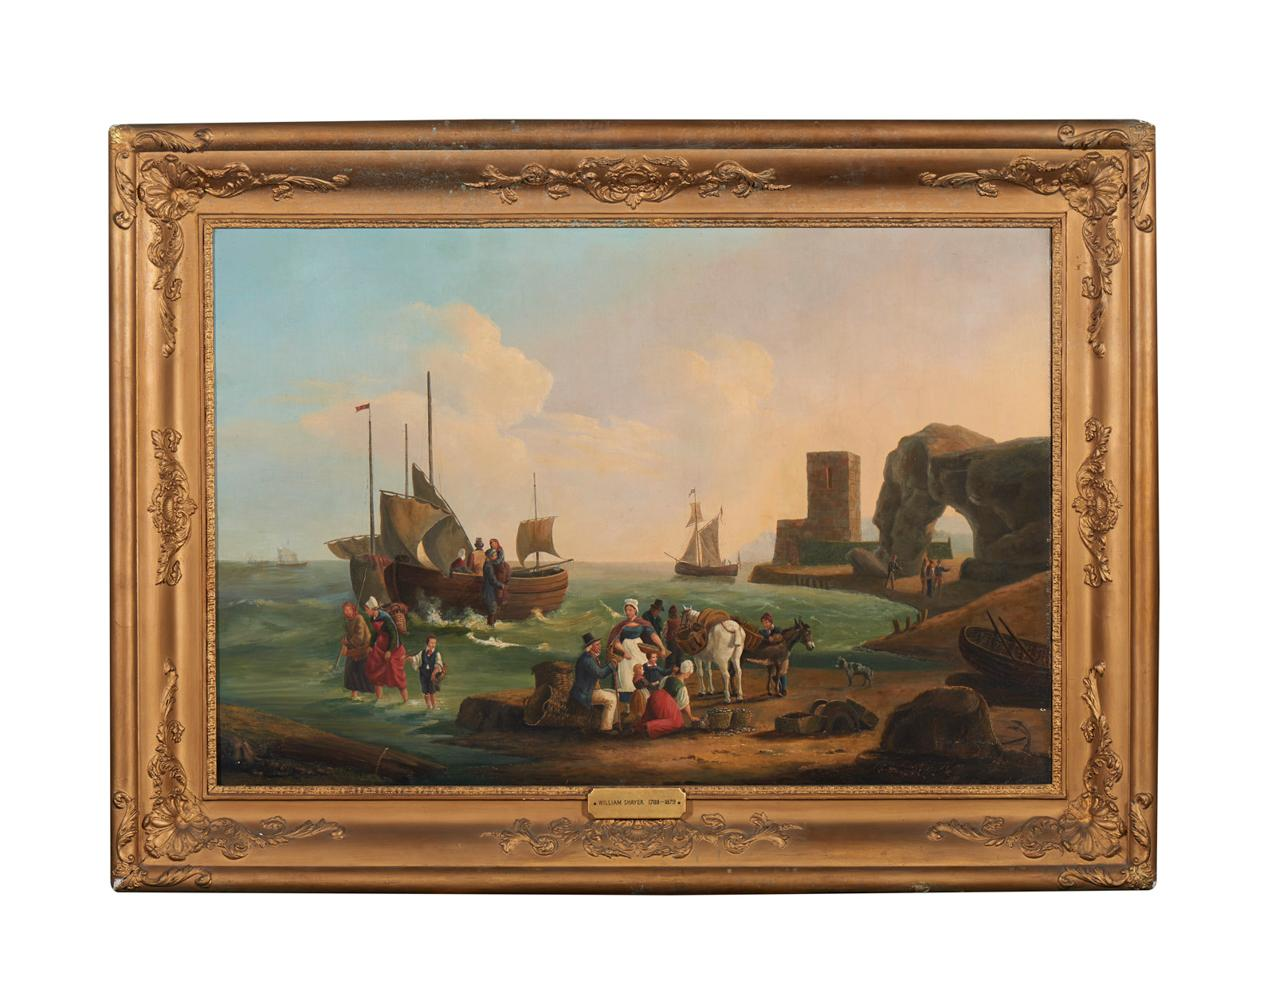 Círculo de William Shayer, Óleo s/tela, 82 x 121cm